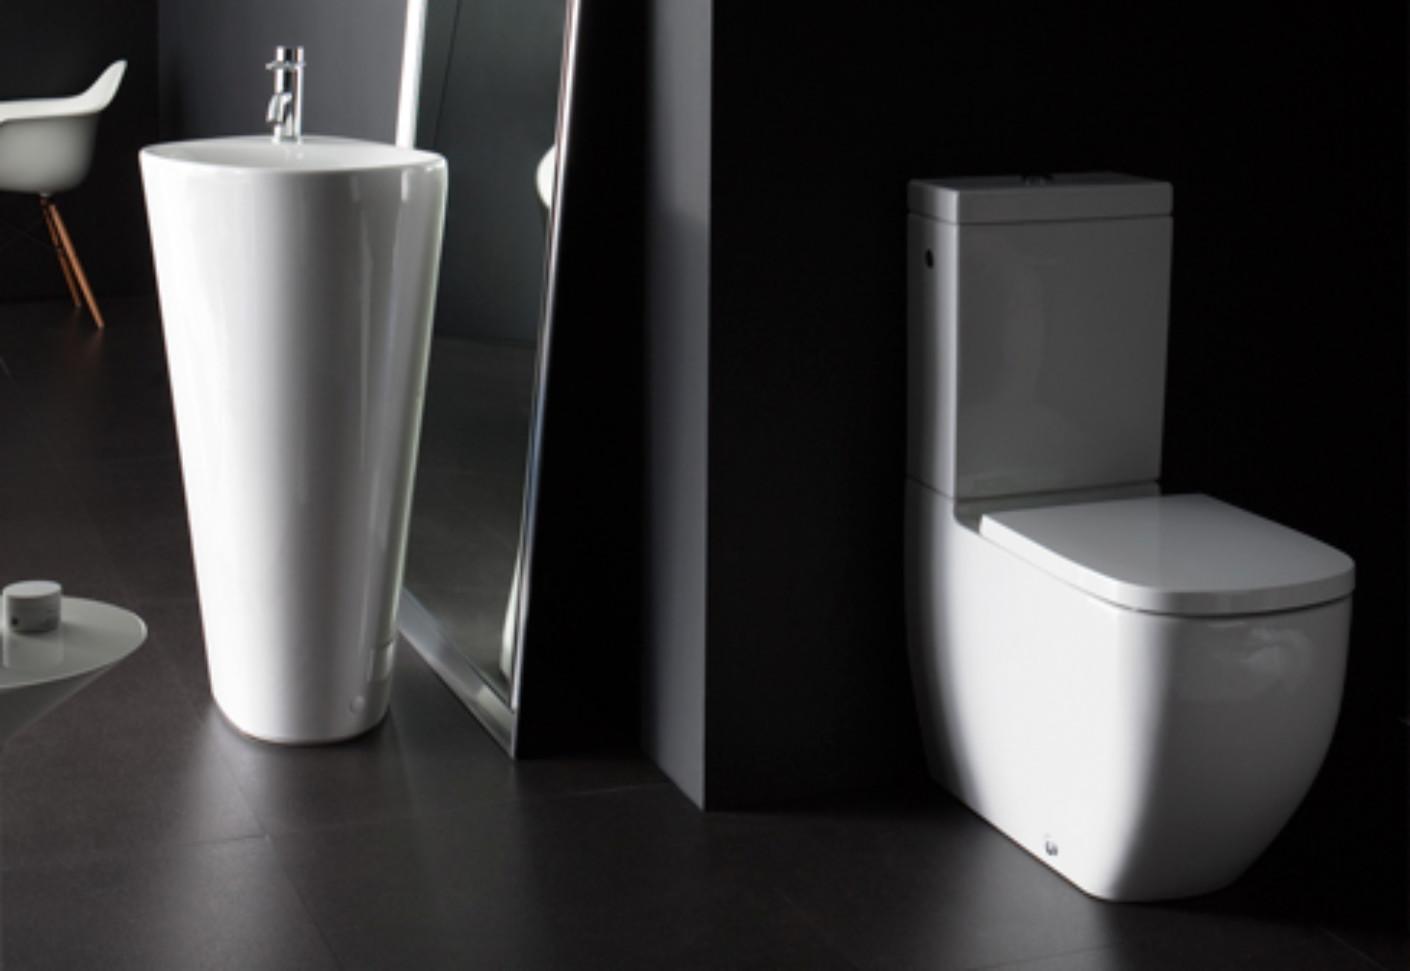 palomba stand wc kombination von laufen stylepark. Black Bedroom Furniture Sets. Home Design Ideas